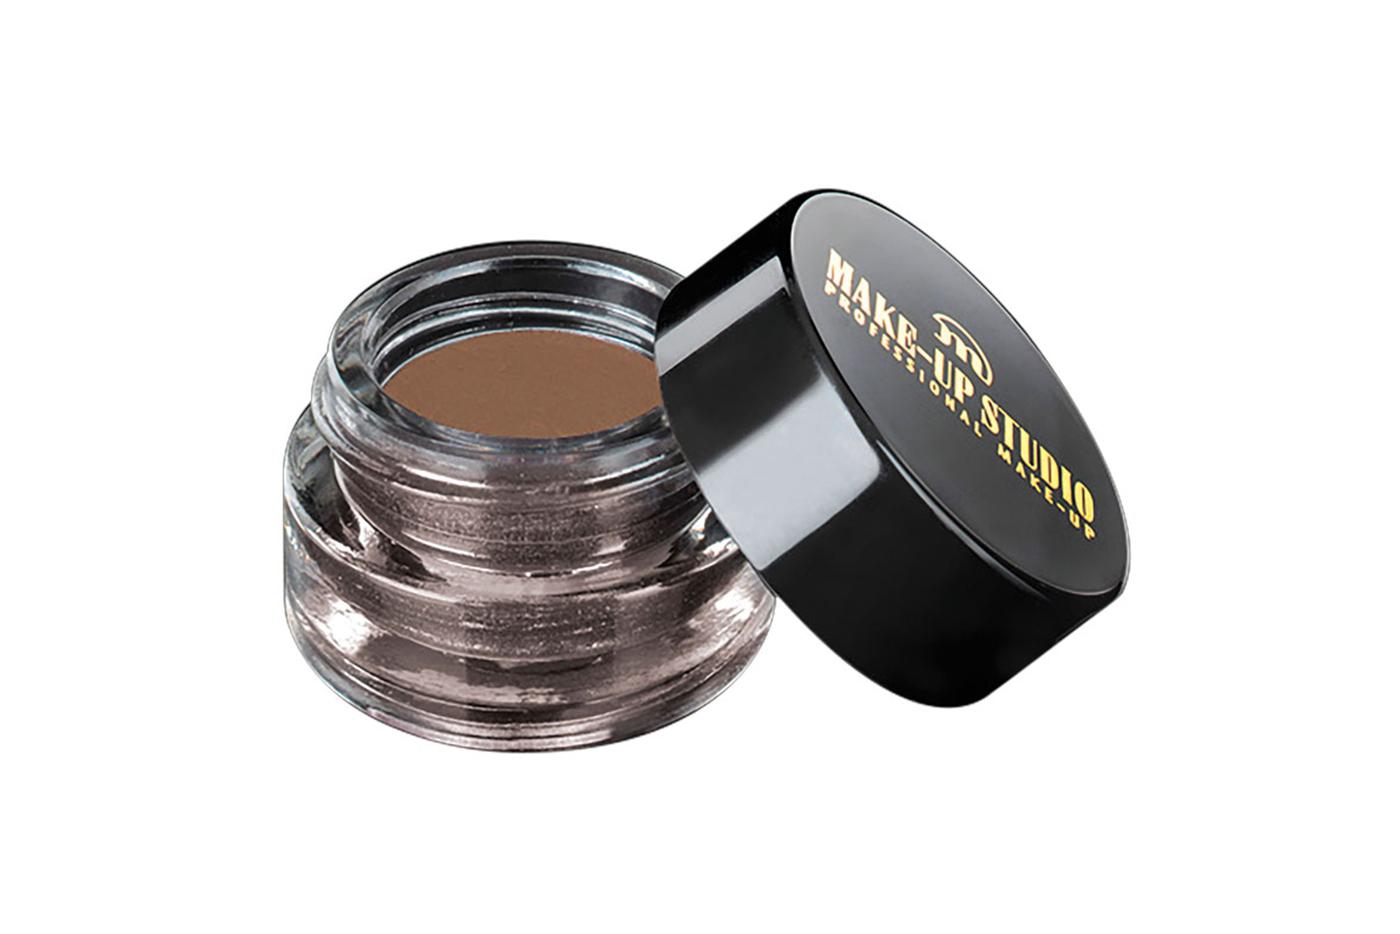 Pro Brow Gel Liner by Make-Up Studio